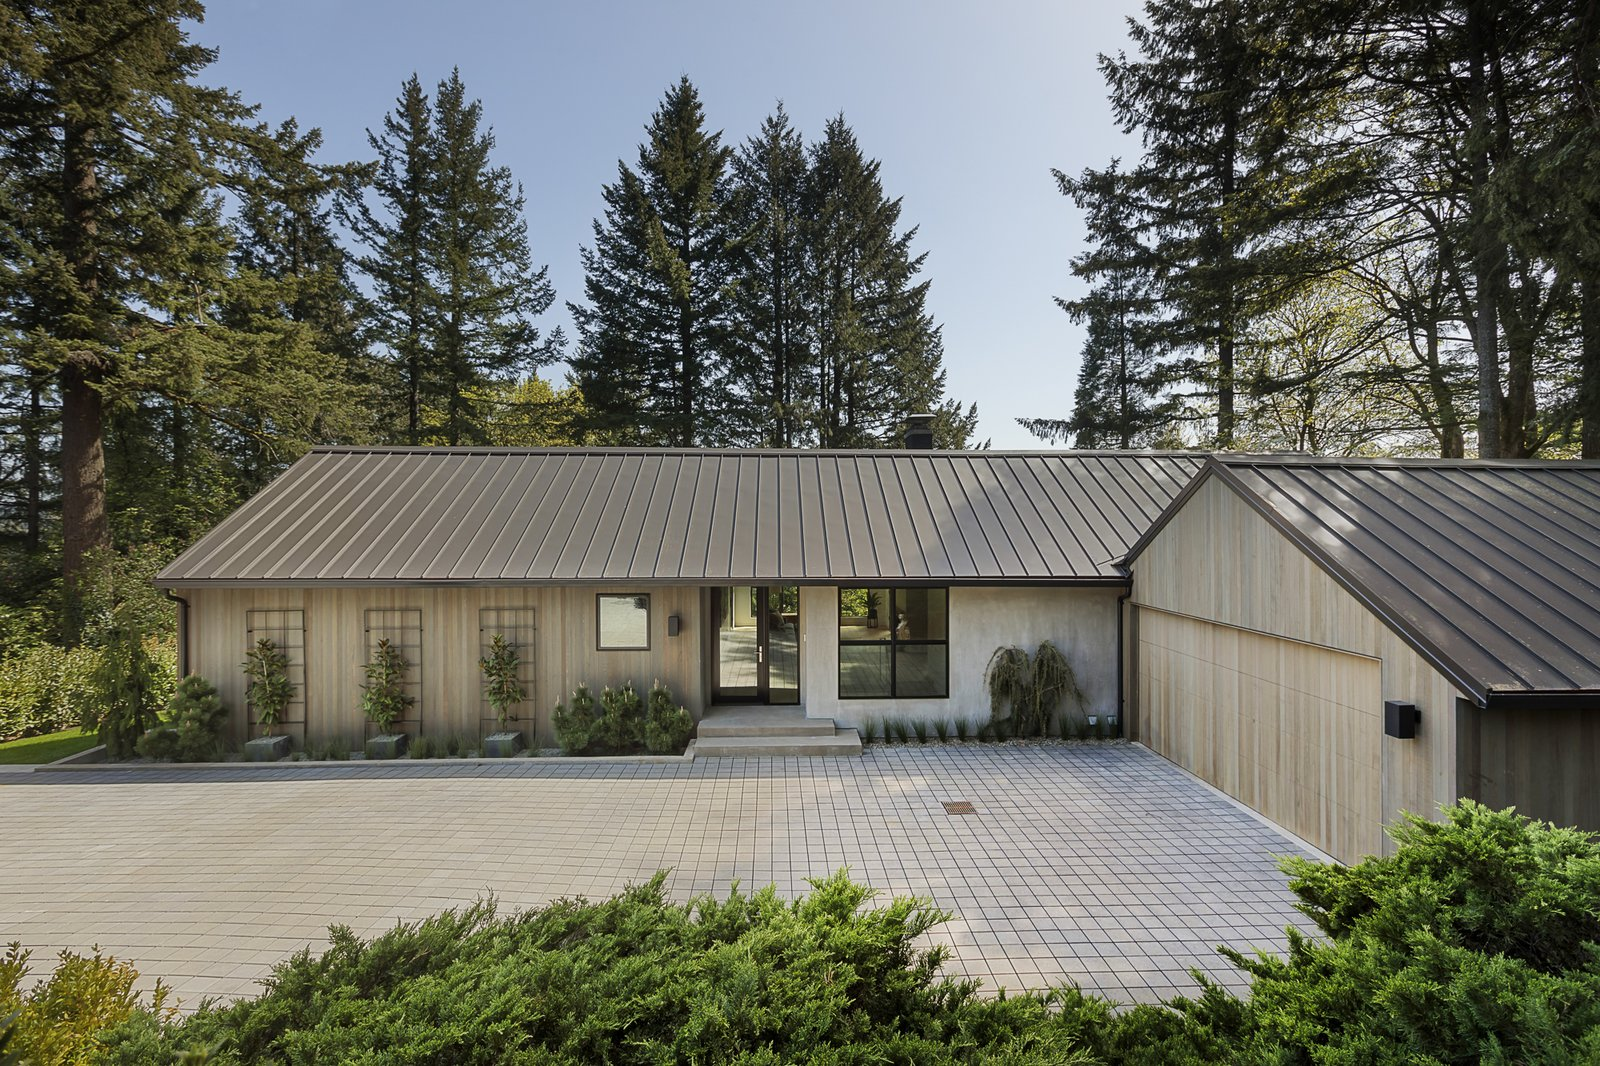 Exterior, Metal Roof Material, House Building Type, Concrete Siding Material, and Wood Siding Material  Burton House